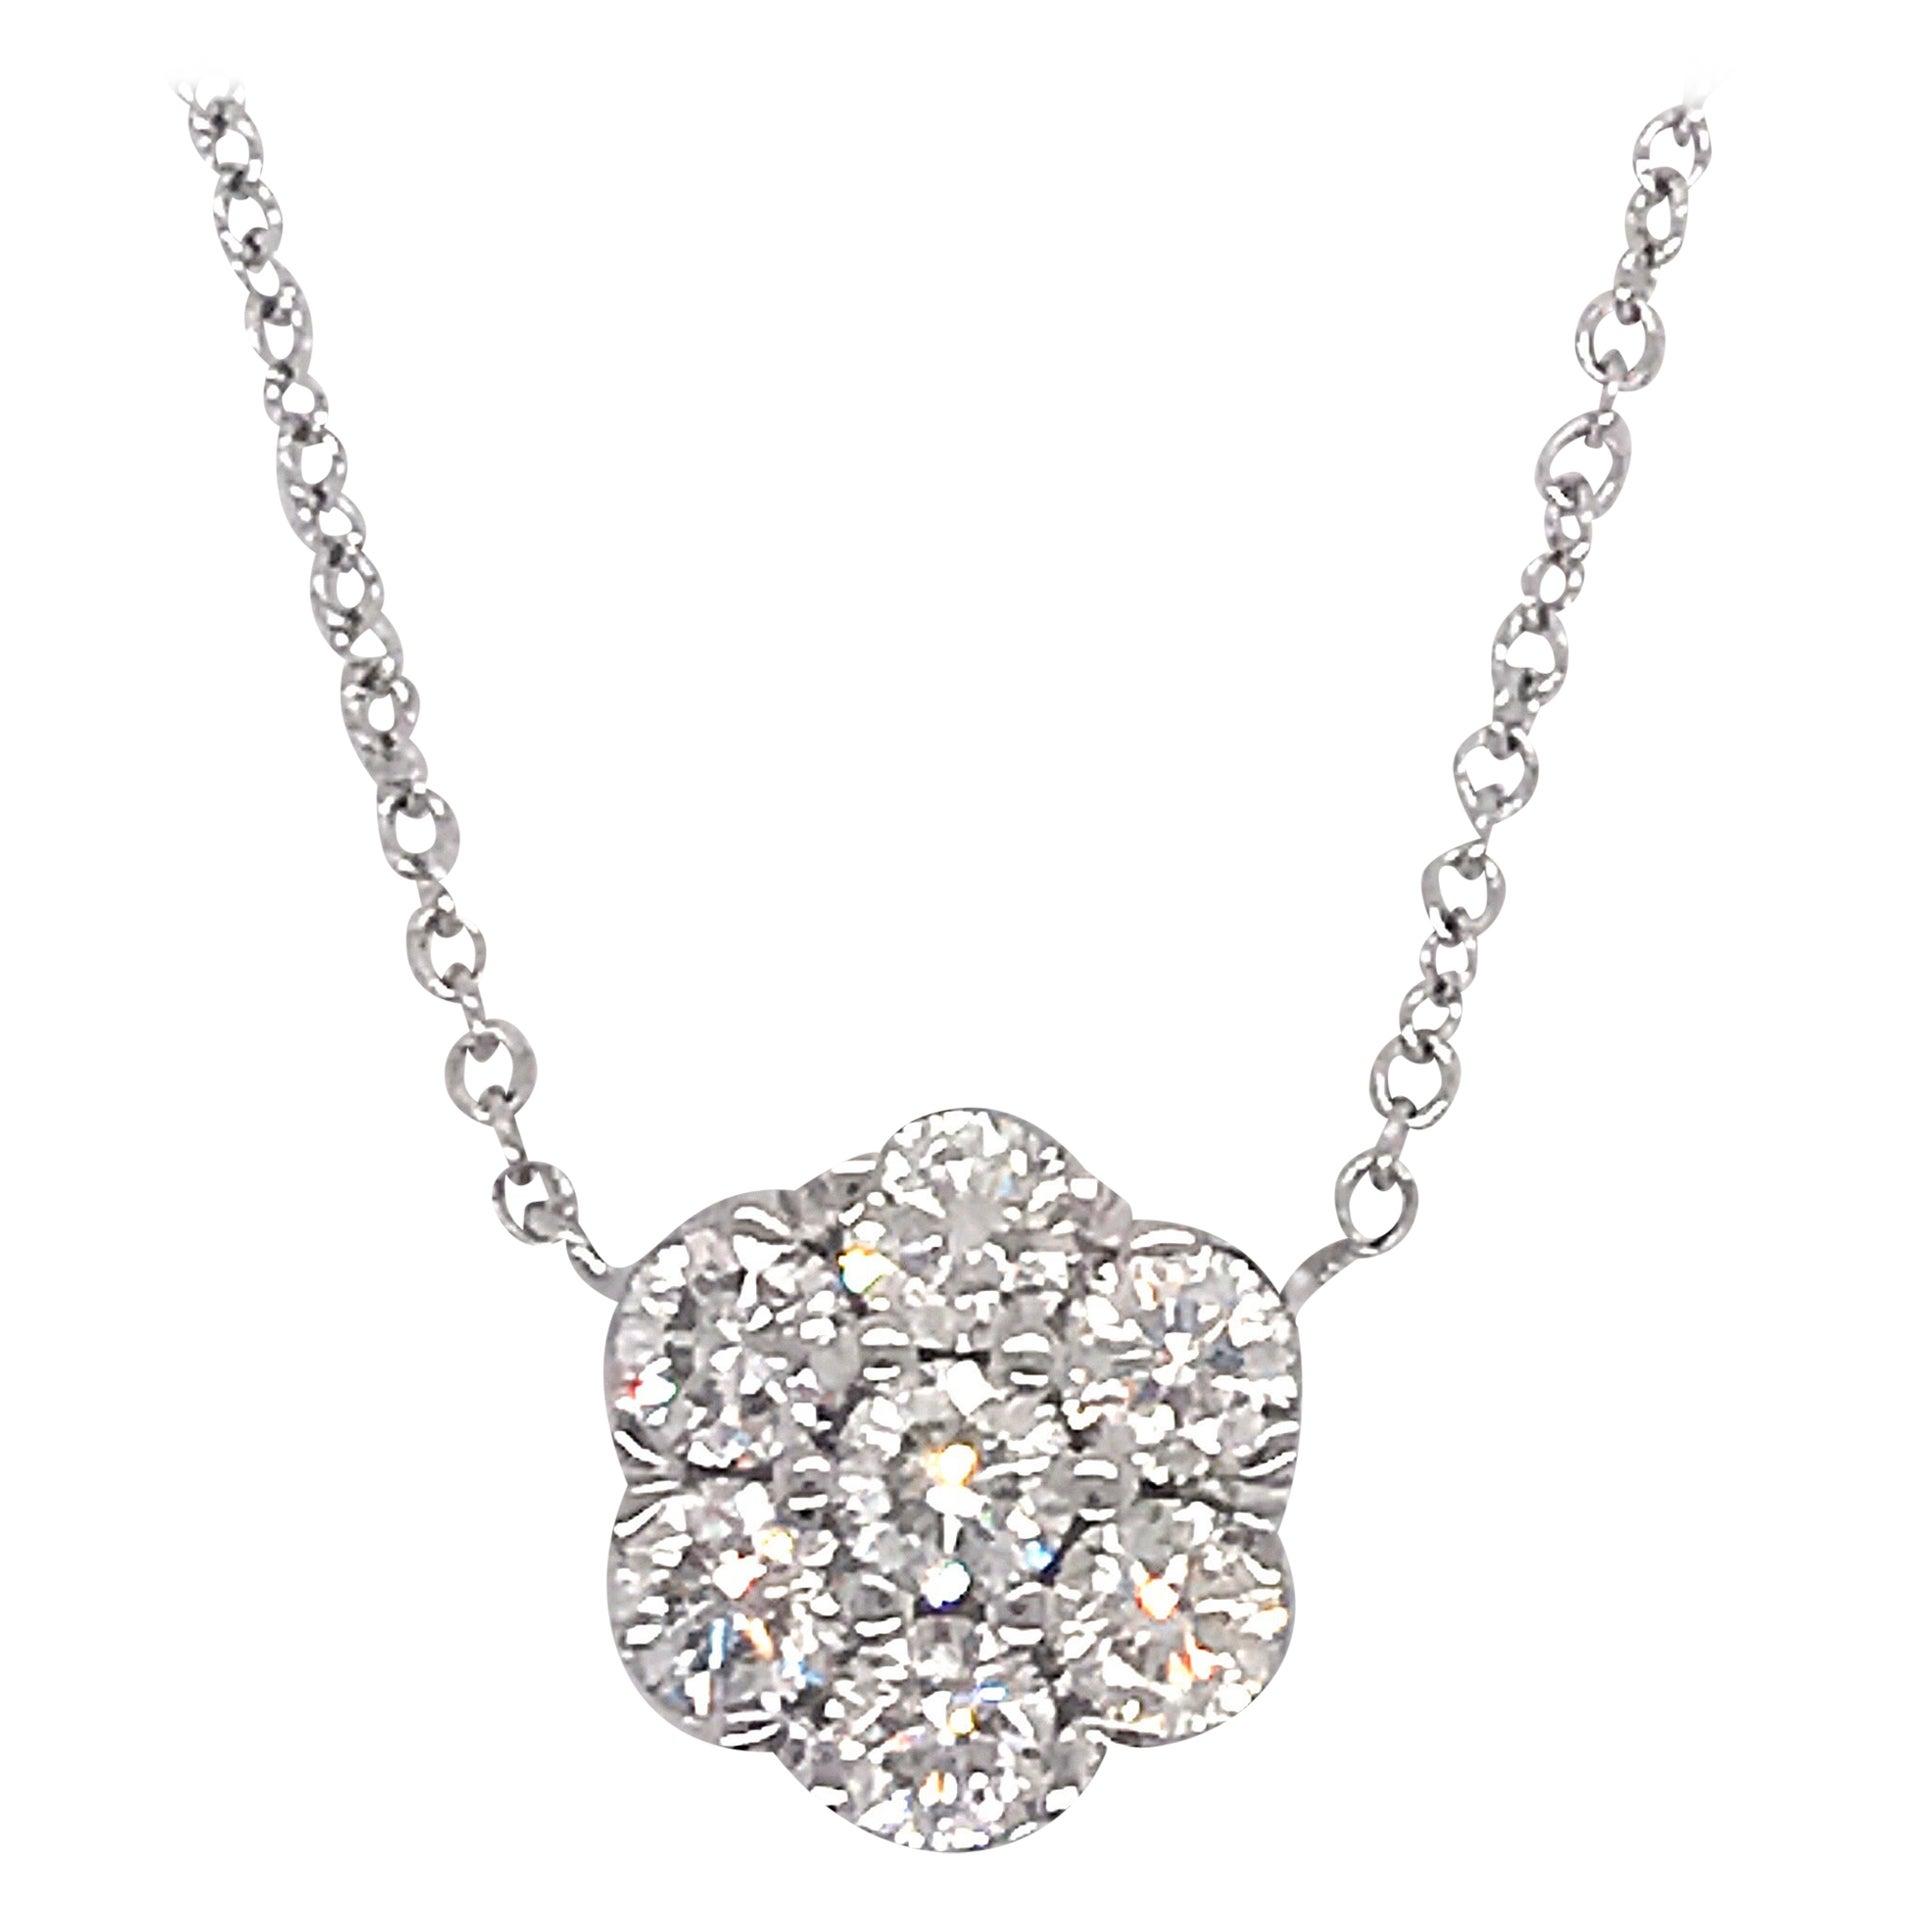 Diamond Floral Cluster Pendant 1.37 Carat 18 Karat White Gold